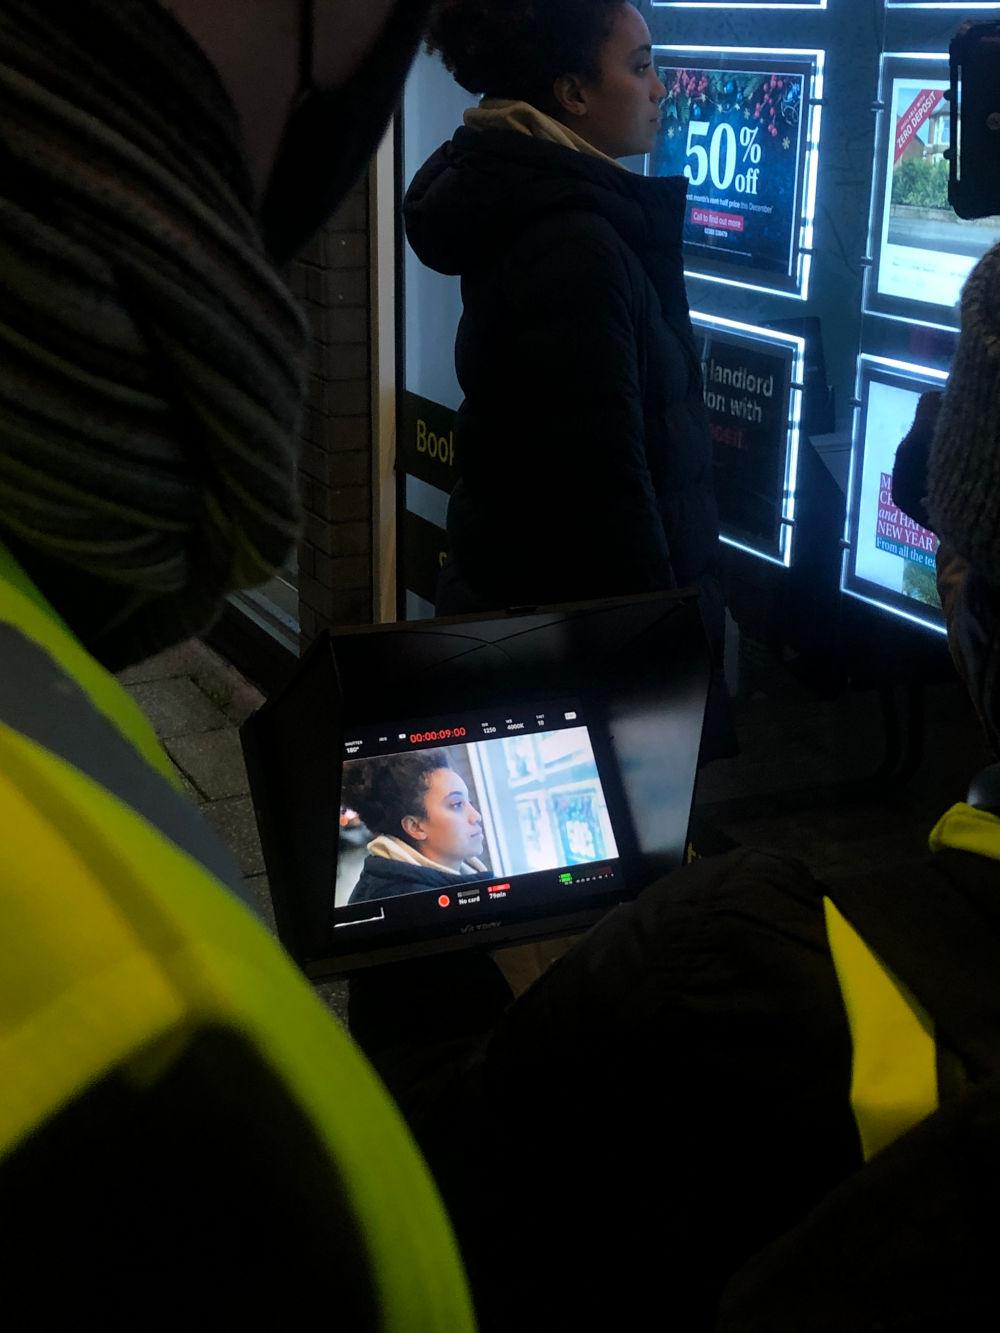 Behind the scenes image from Liam Calvert's Voyager short film. We see actor Sophie Delora Jones